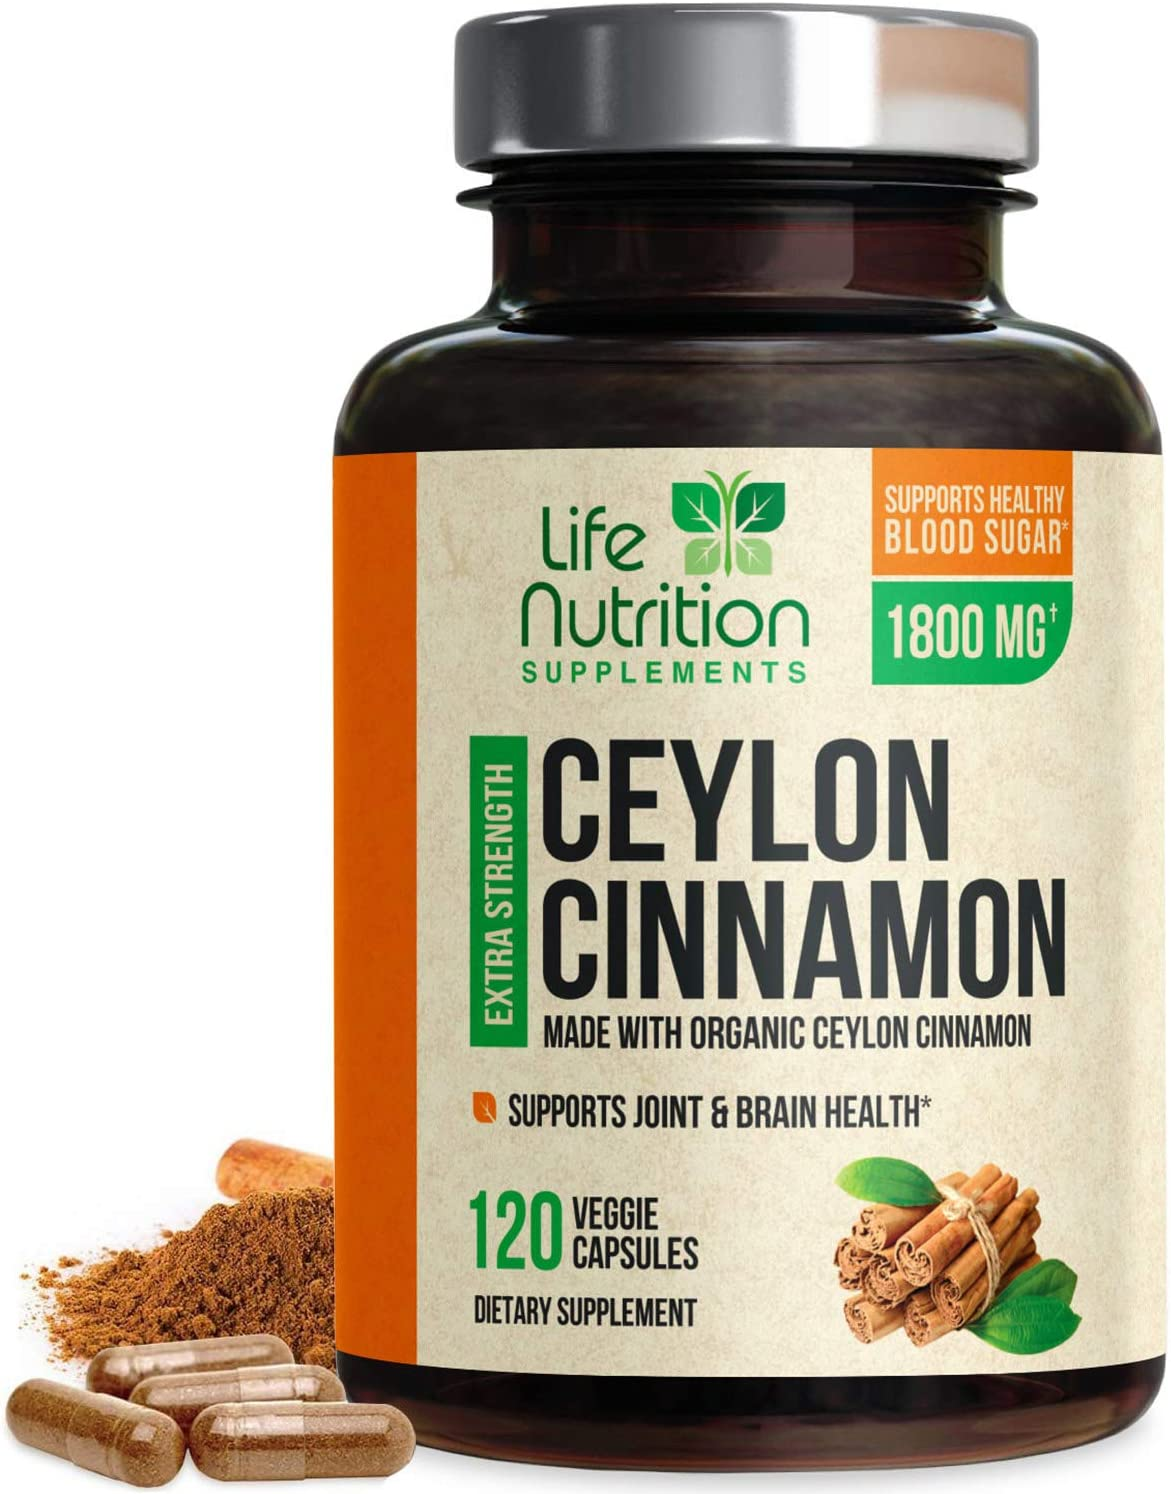 Certified Organic Ceylon Cinnamon (Made with Organic Ceylon Cinnamon) 1800mg - Organic Sri Lanka Ceylon Cinnamon Powder Pills - Made in USA - Best Vegan Blood Sugar Support Supplement - 120 Capsules